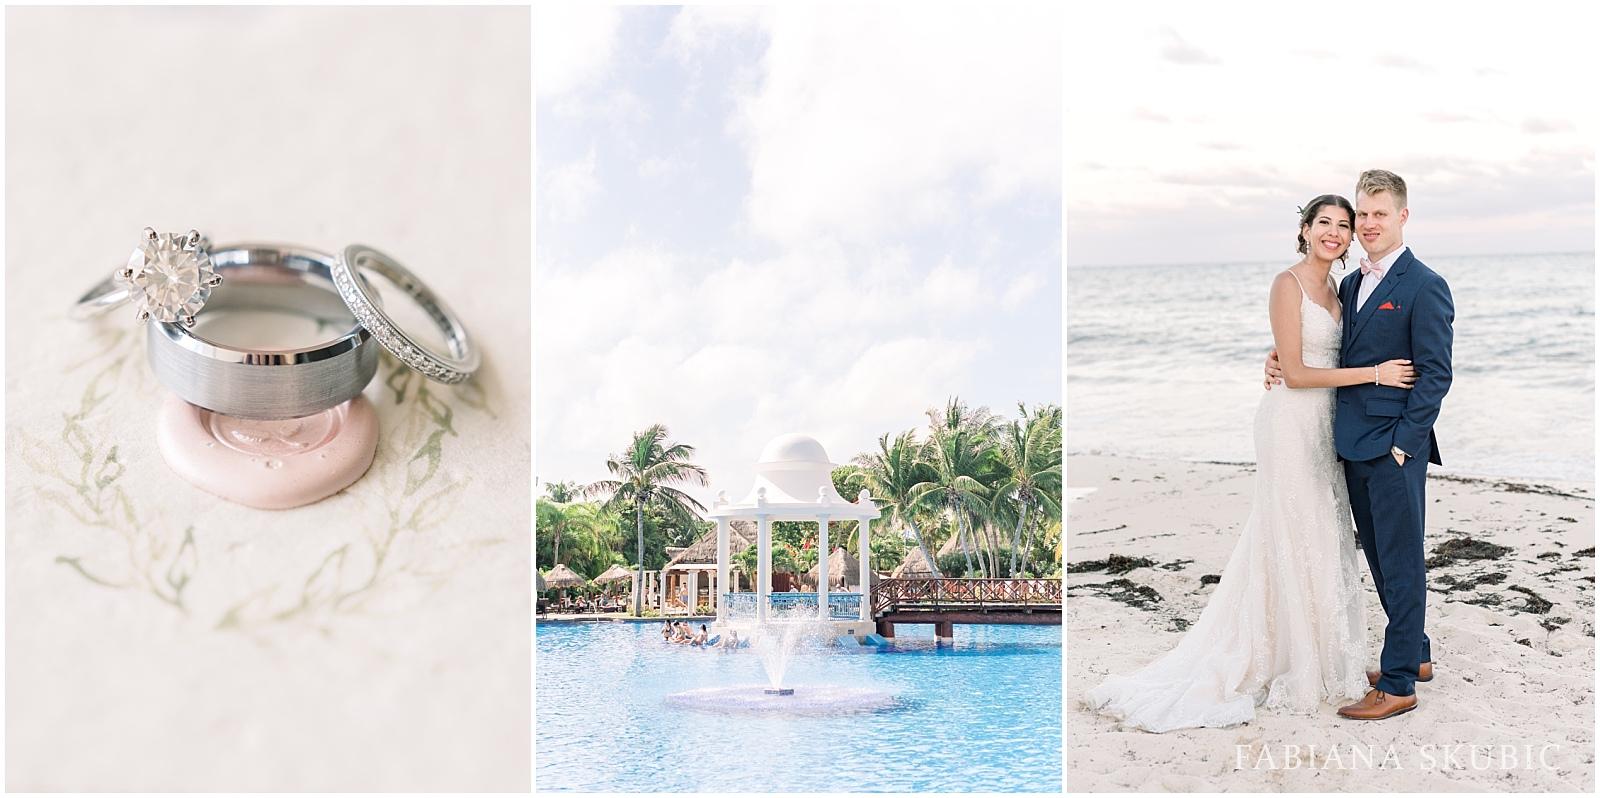 TJ_Now_Sapphire_Riviera_Cancun_Mexico_Wedding_Photos_0293.jpg